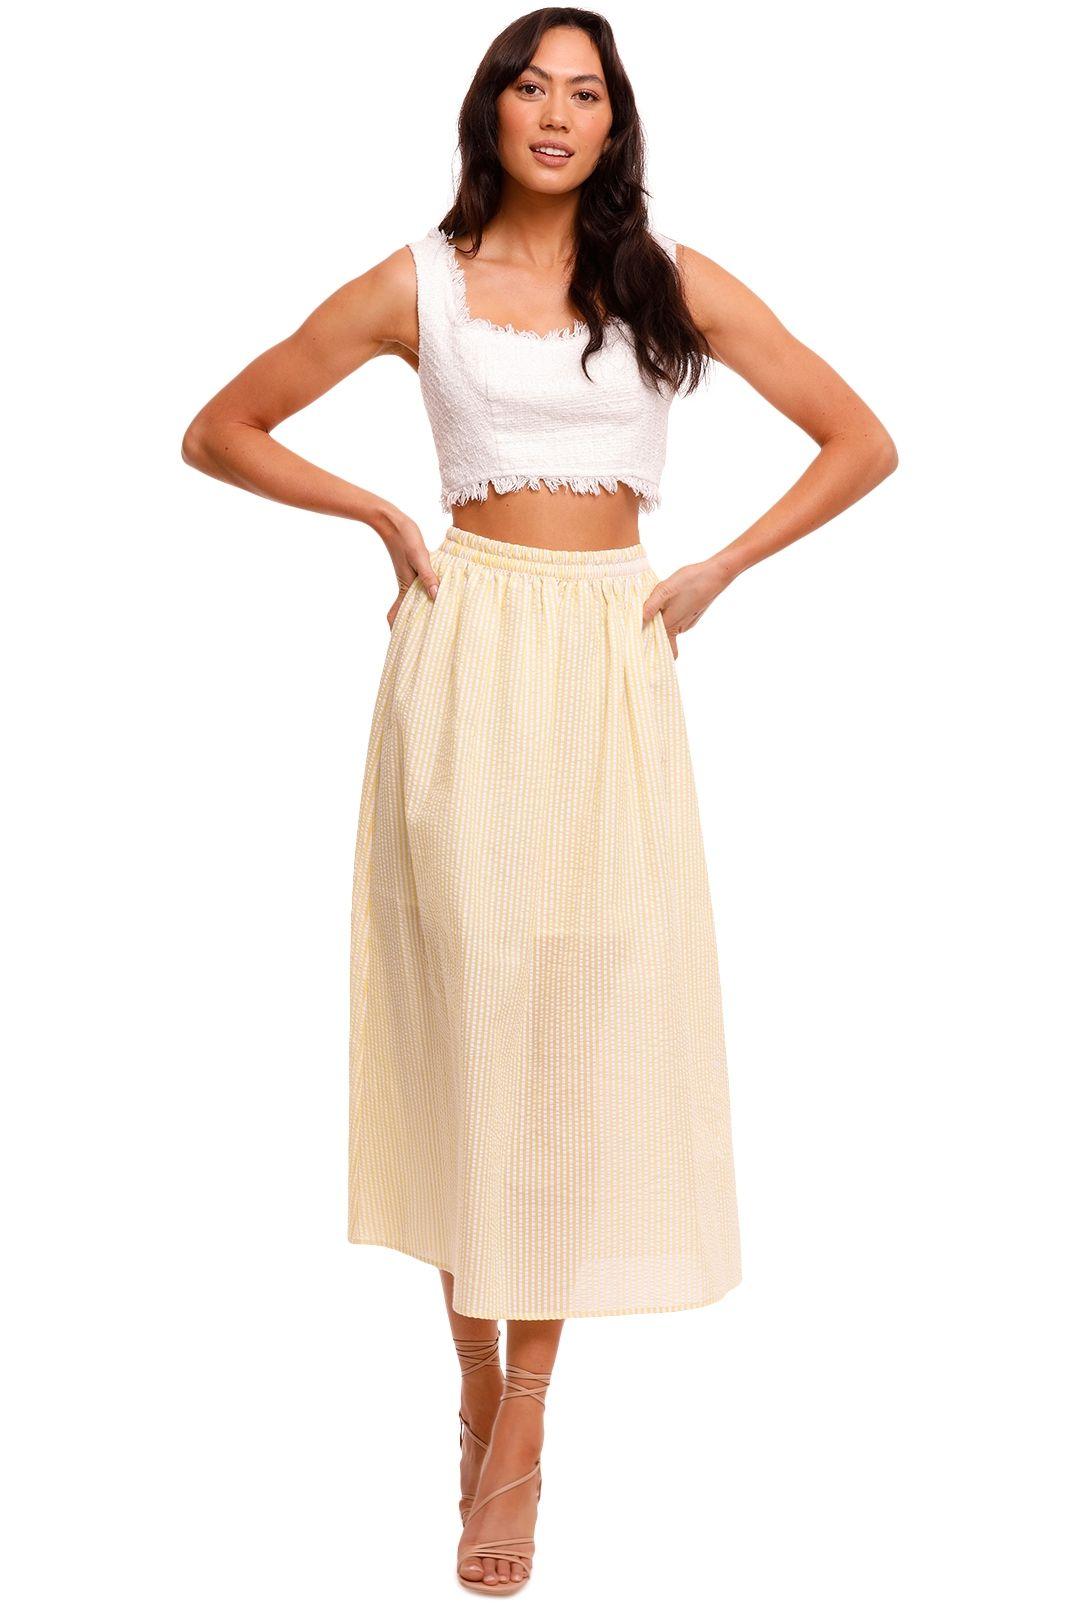 Steele Rolland Skirt Check